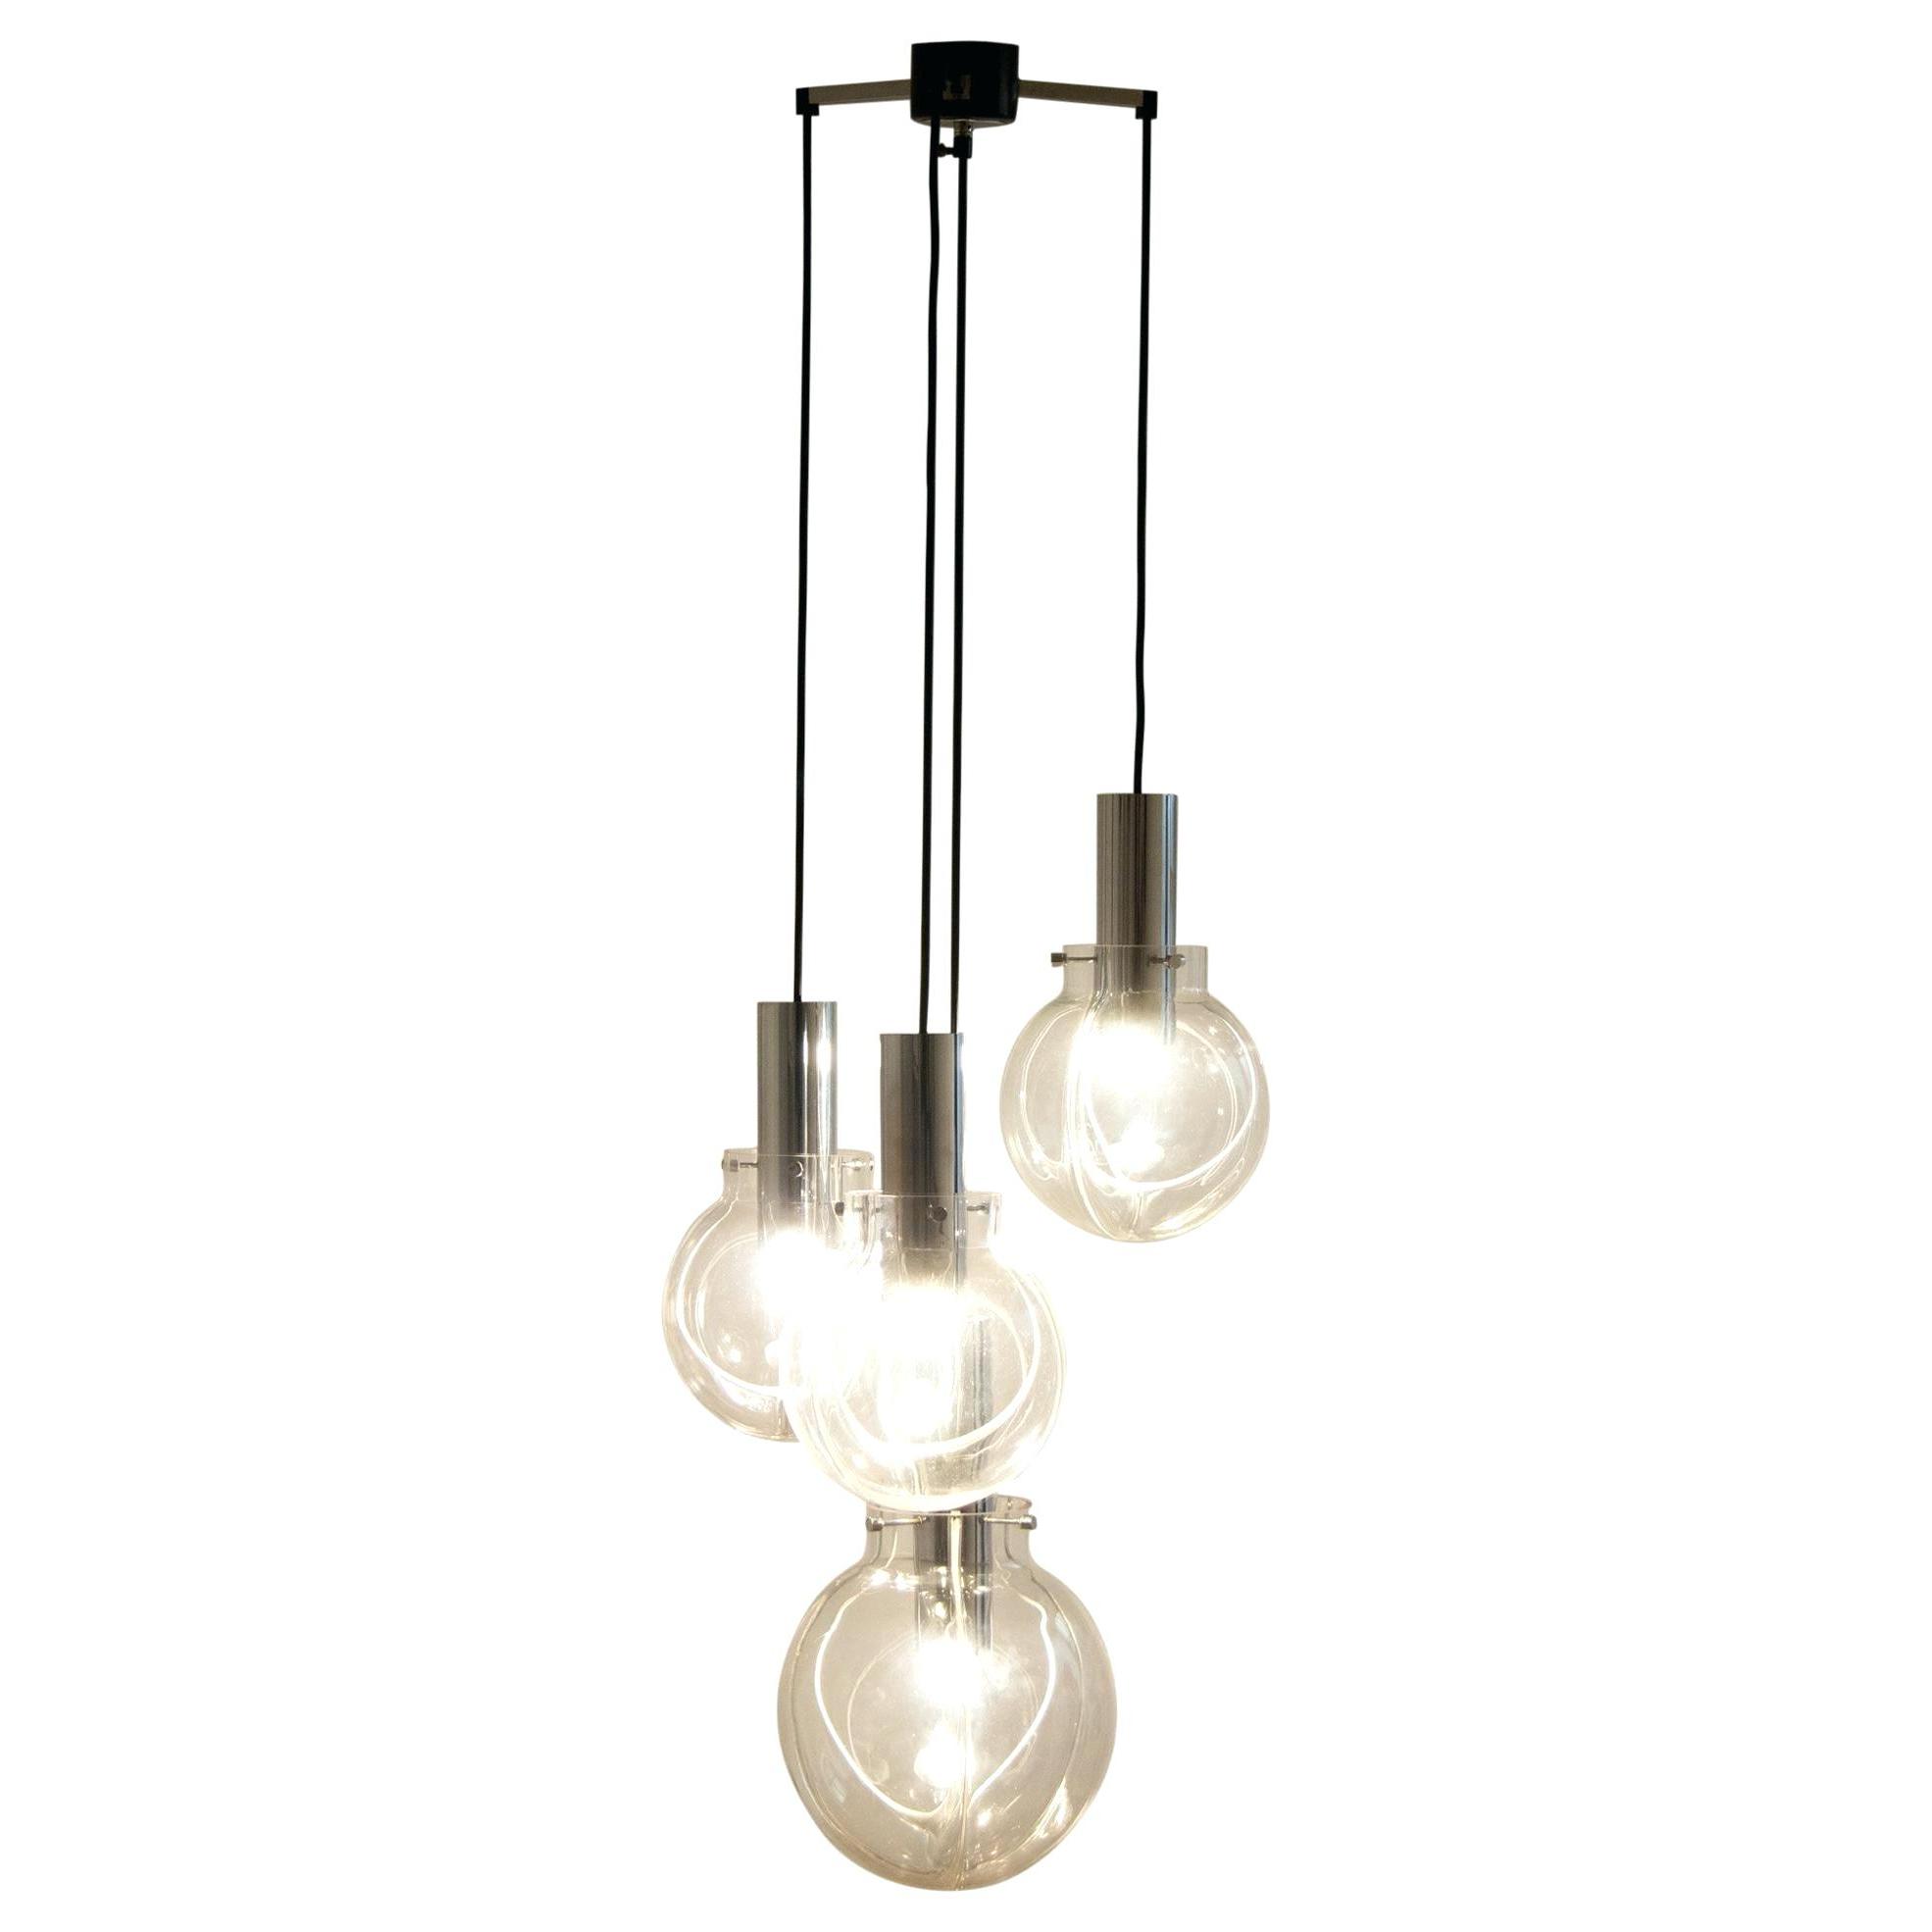 2020 Gregoire 6 Light Globe Chandeliers Intended For Globe Light Chandelier – Theflex (View 1 of 25)